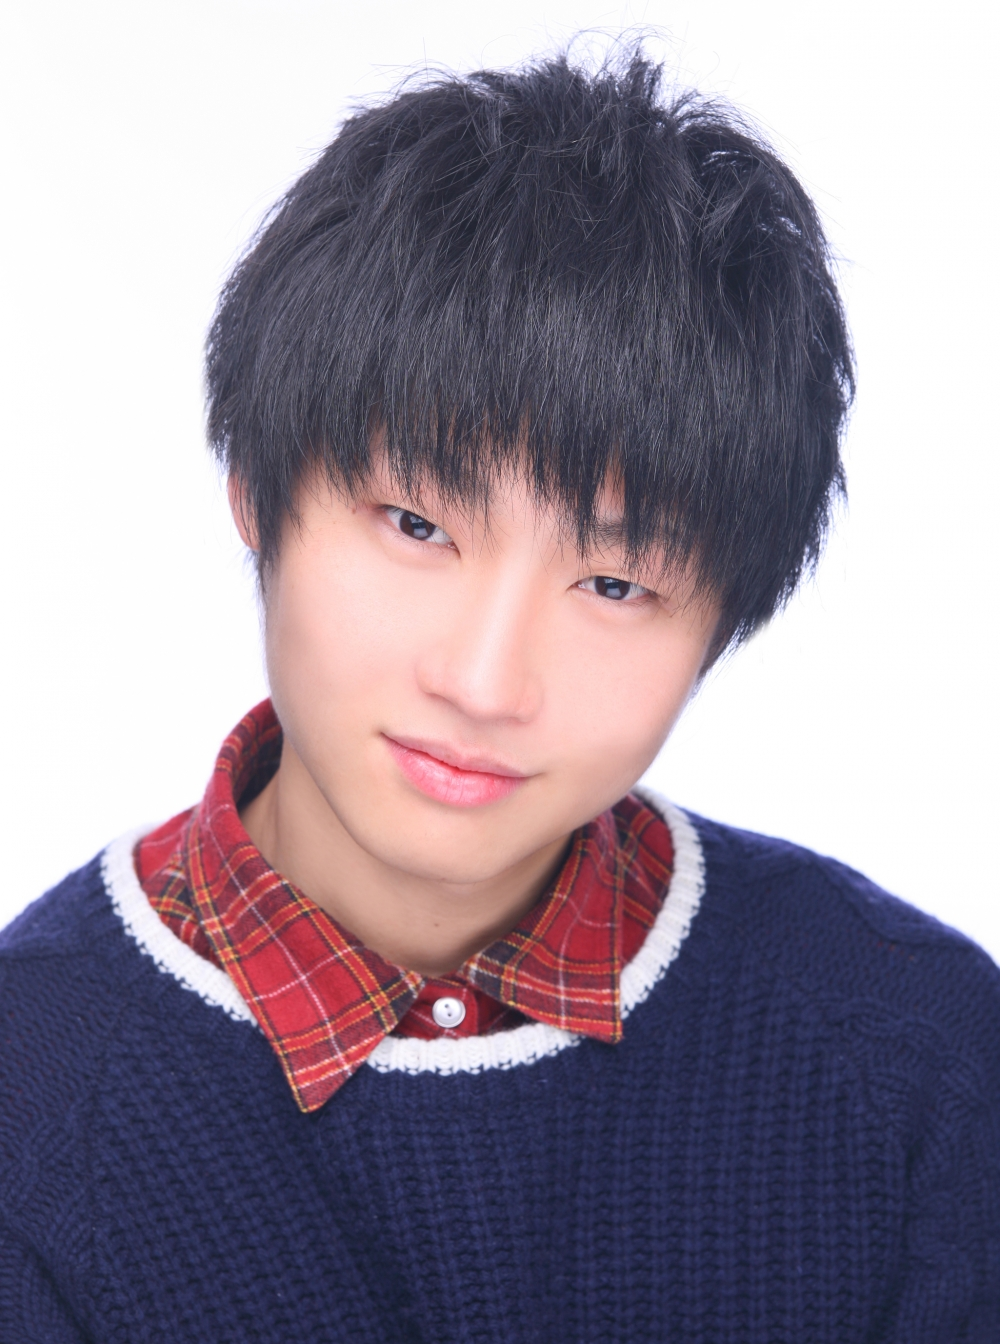 File:TakuyaIwabata.jpg